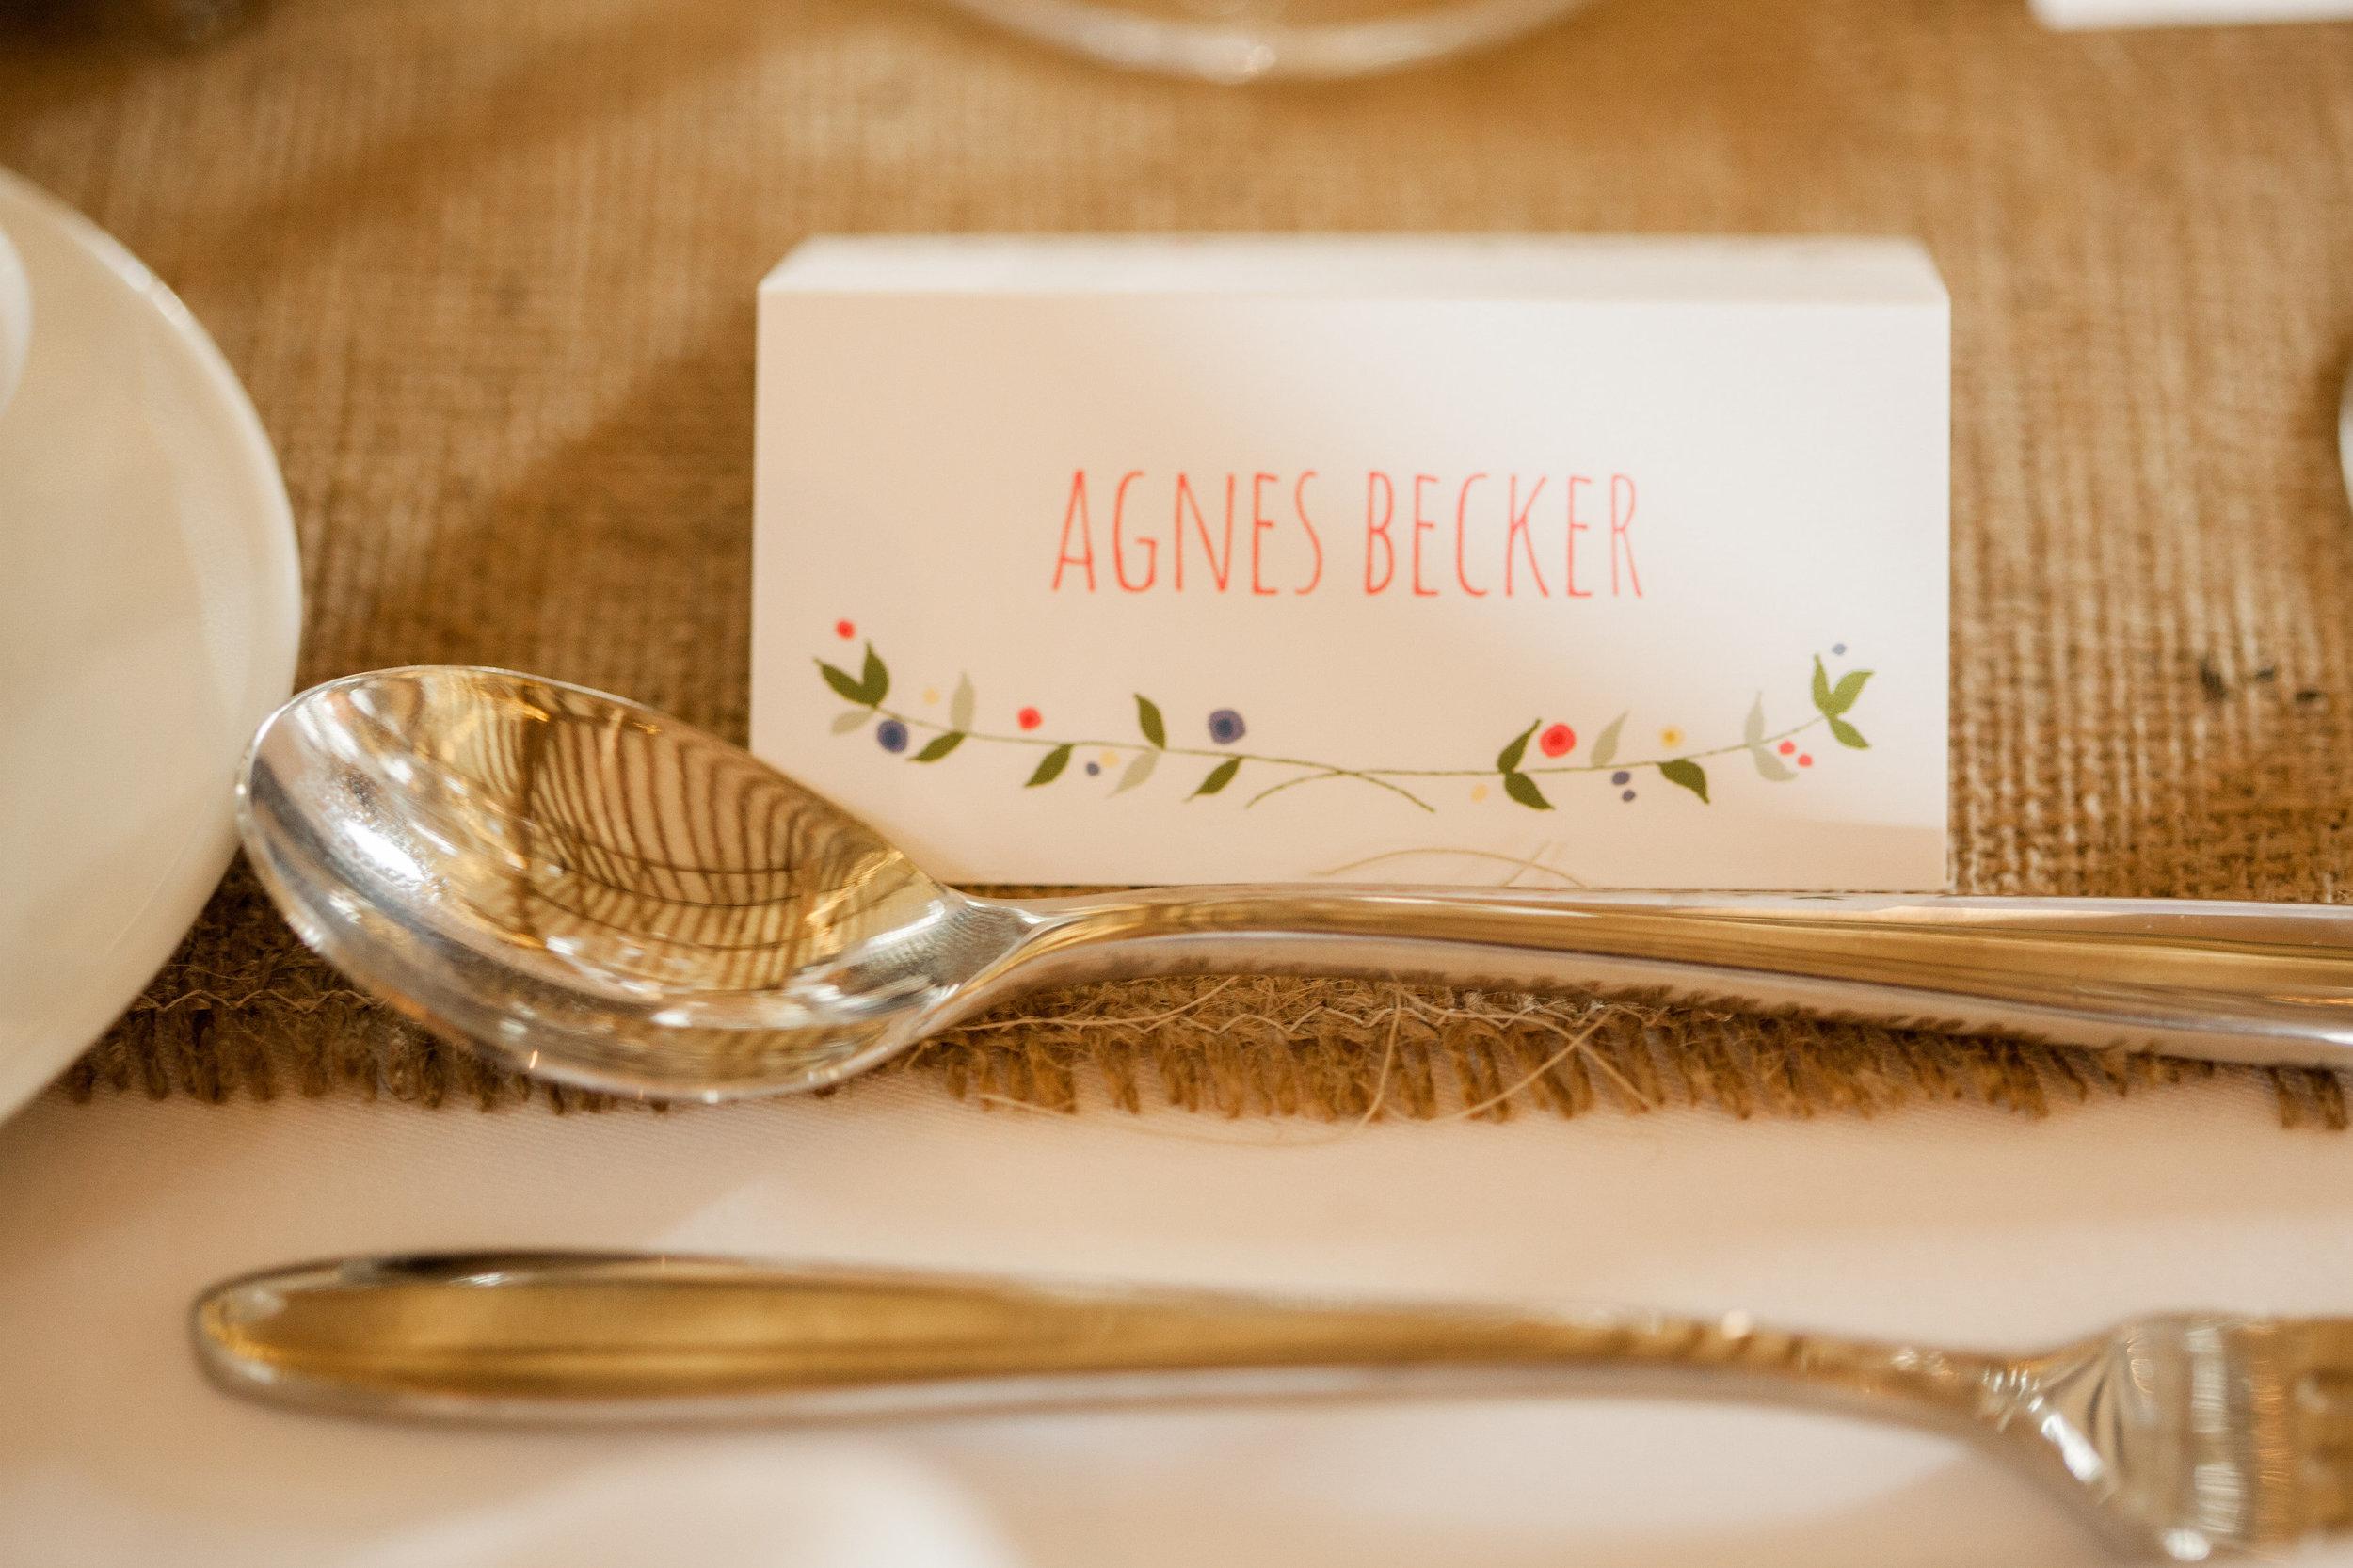 agnes placecard.jpg